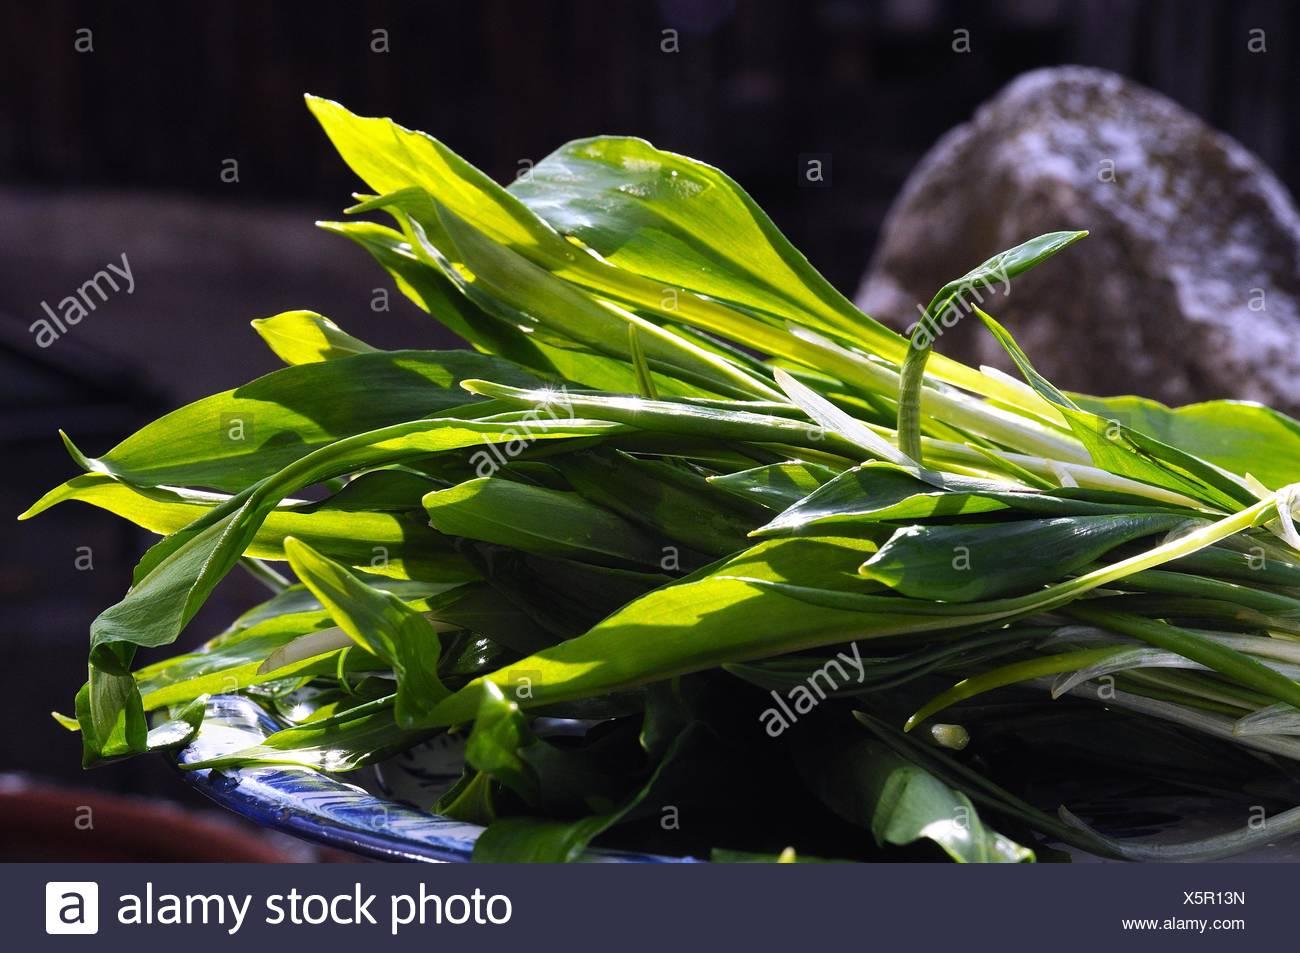 Ramson leafs - Stock Image